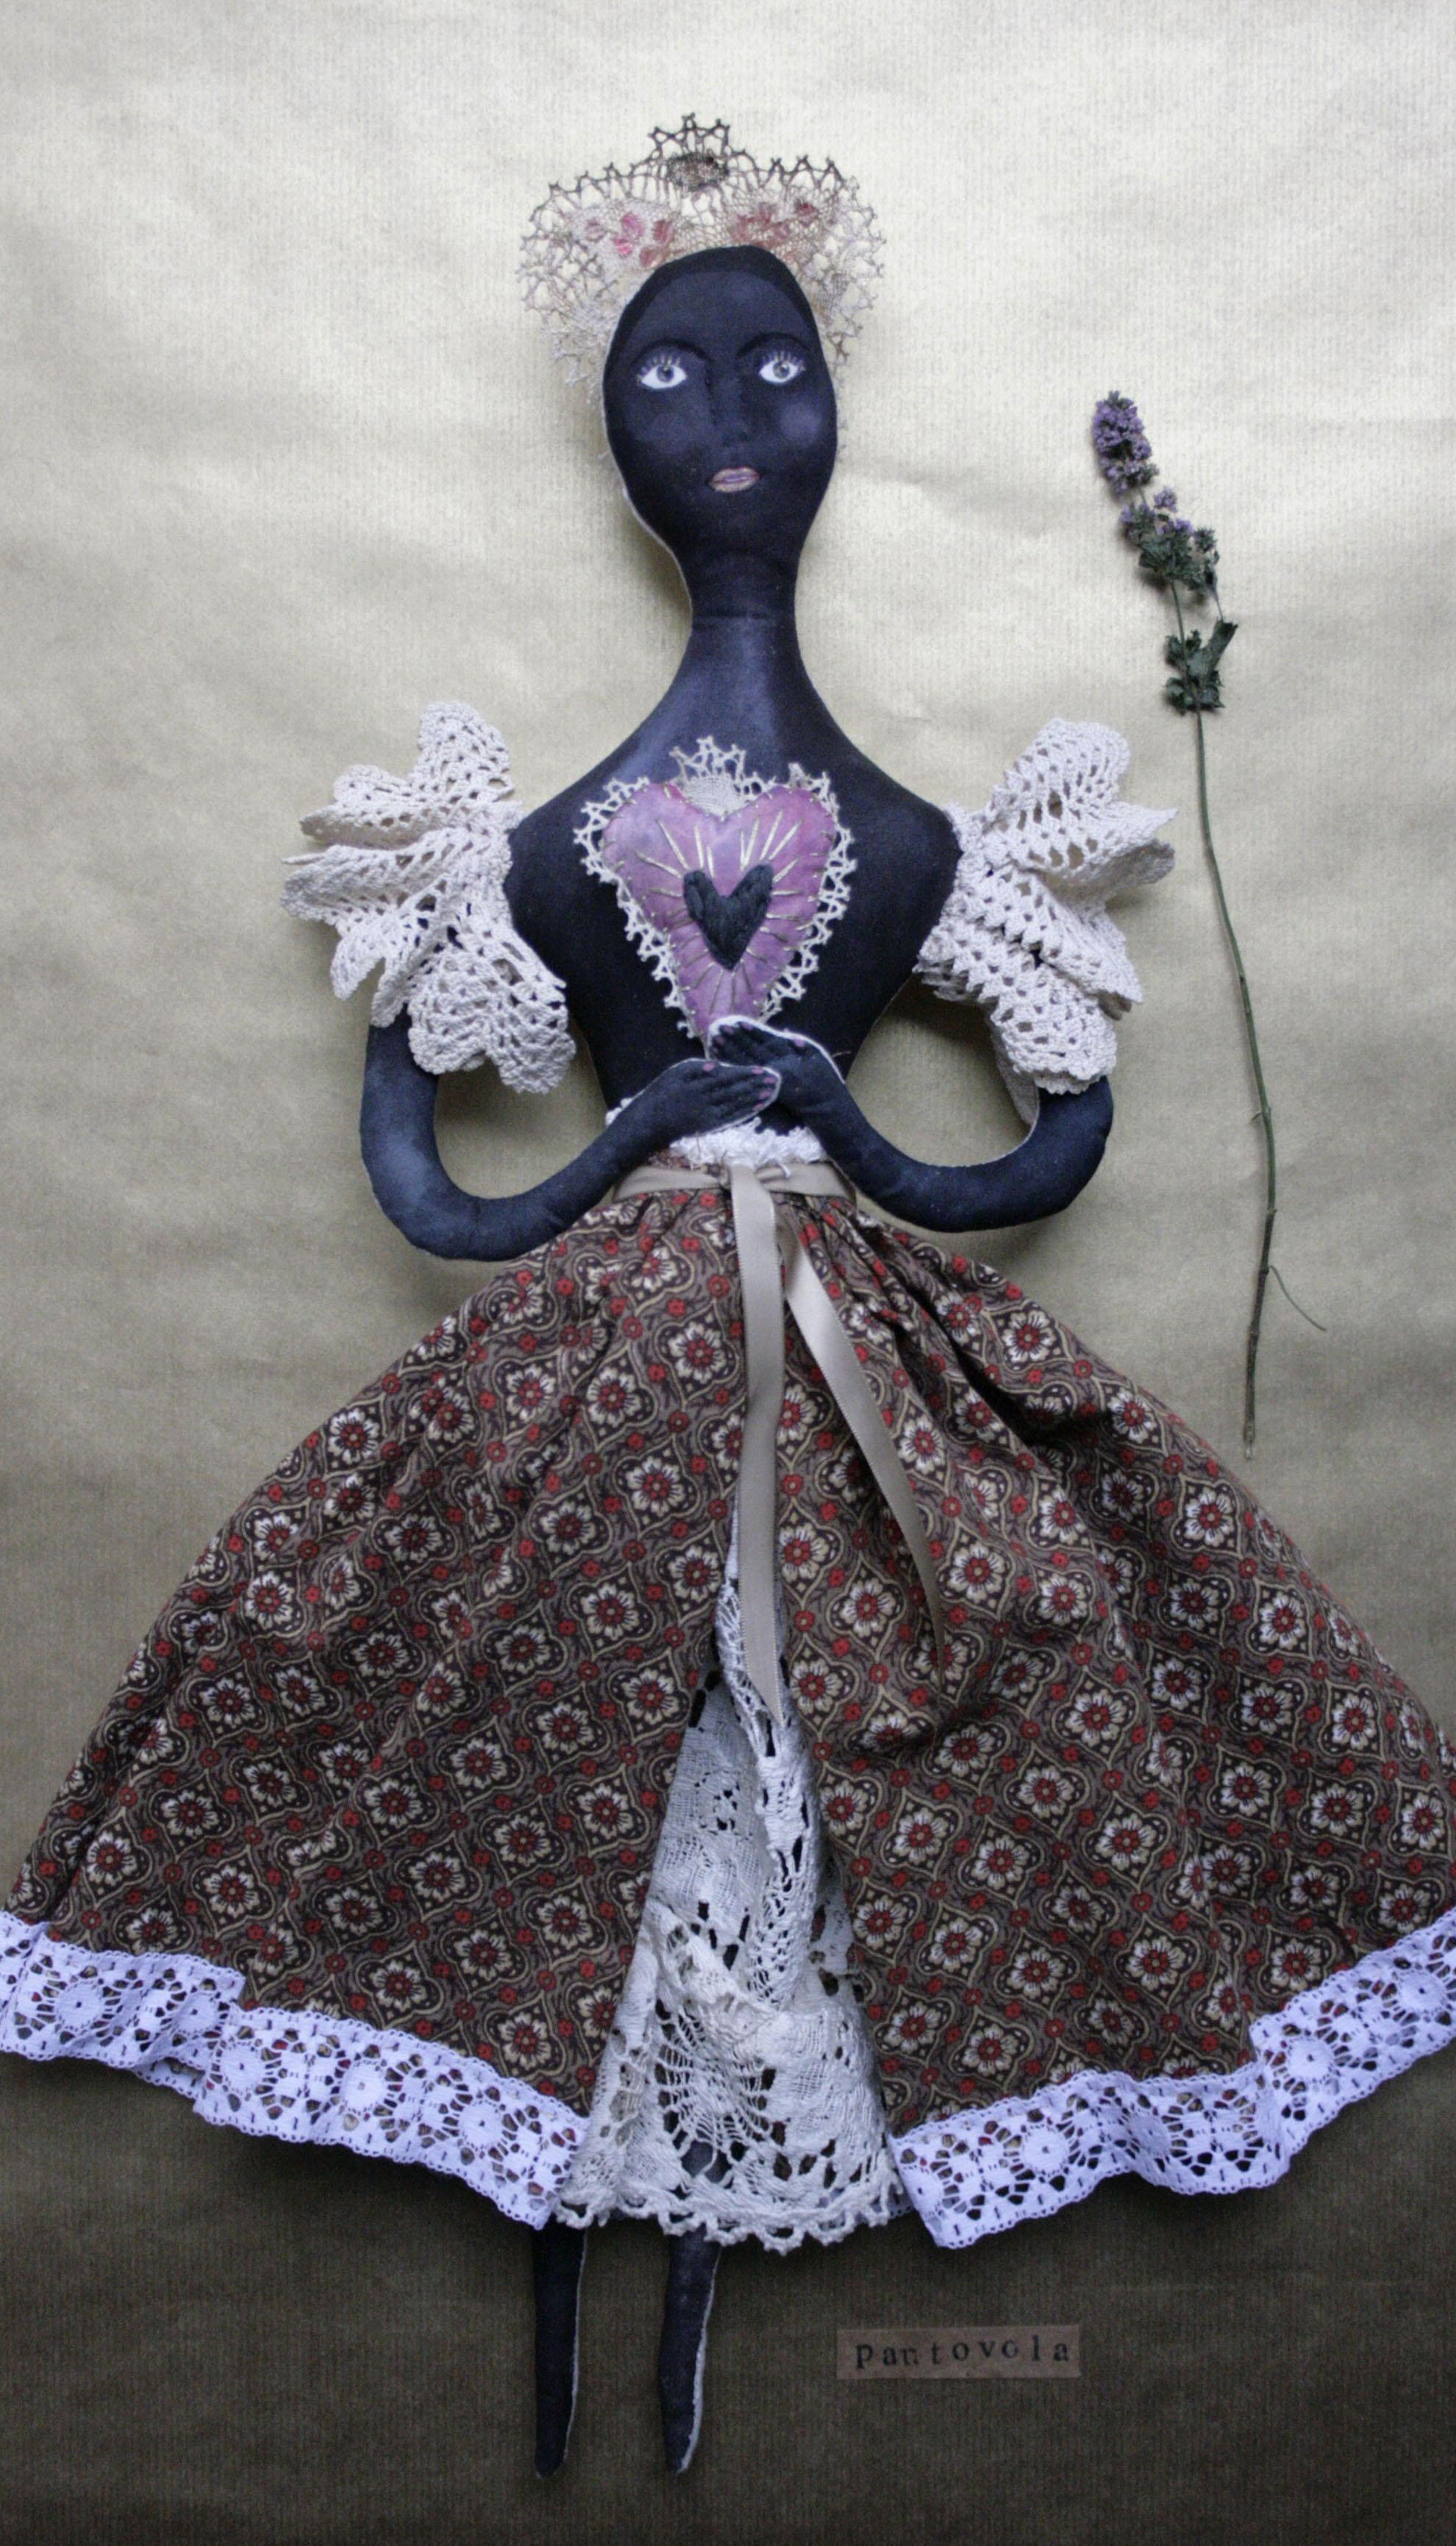 black madonna doll